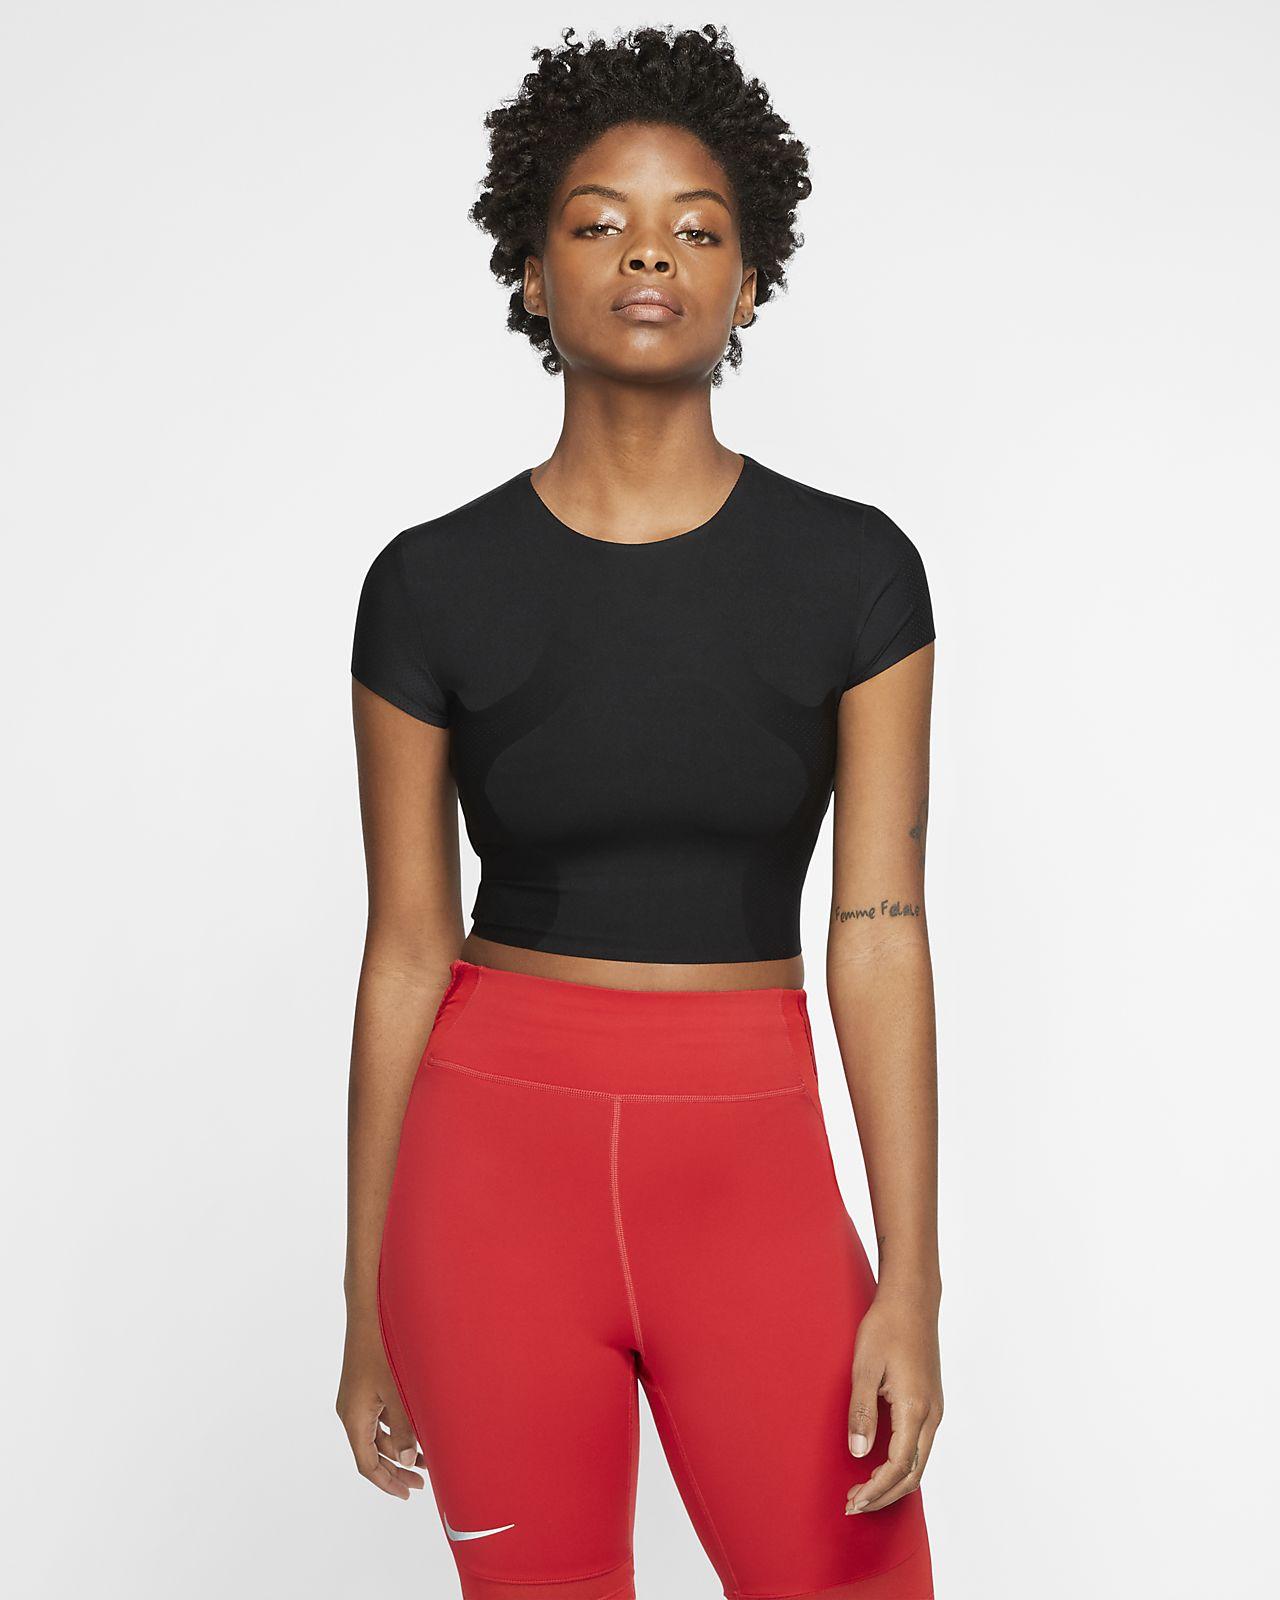 Nike City Ready Run Camiseta de running - Mujer